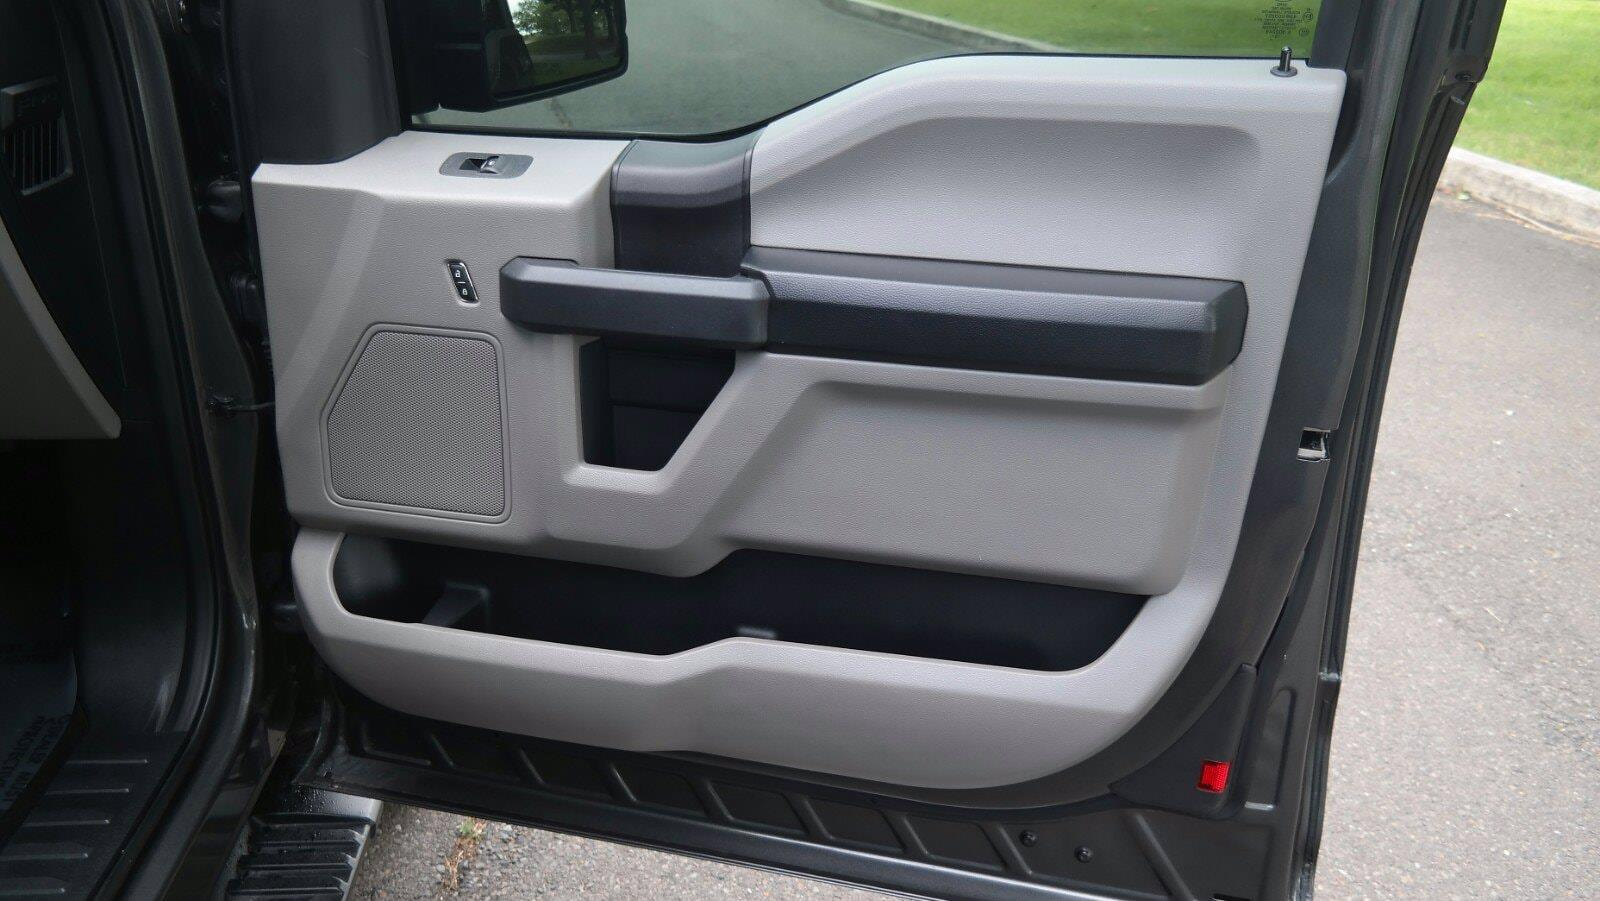 2020 Ford F-150 Super Cab 4x4, Pickup #FL1249C - photo 26